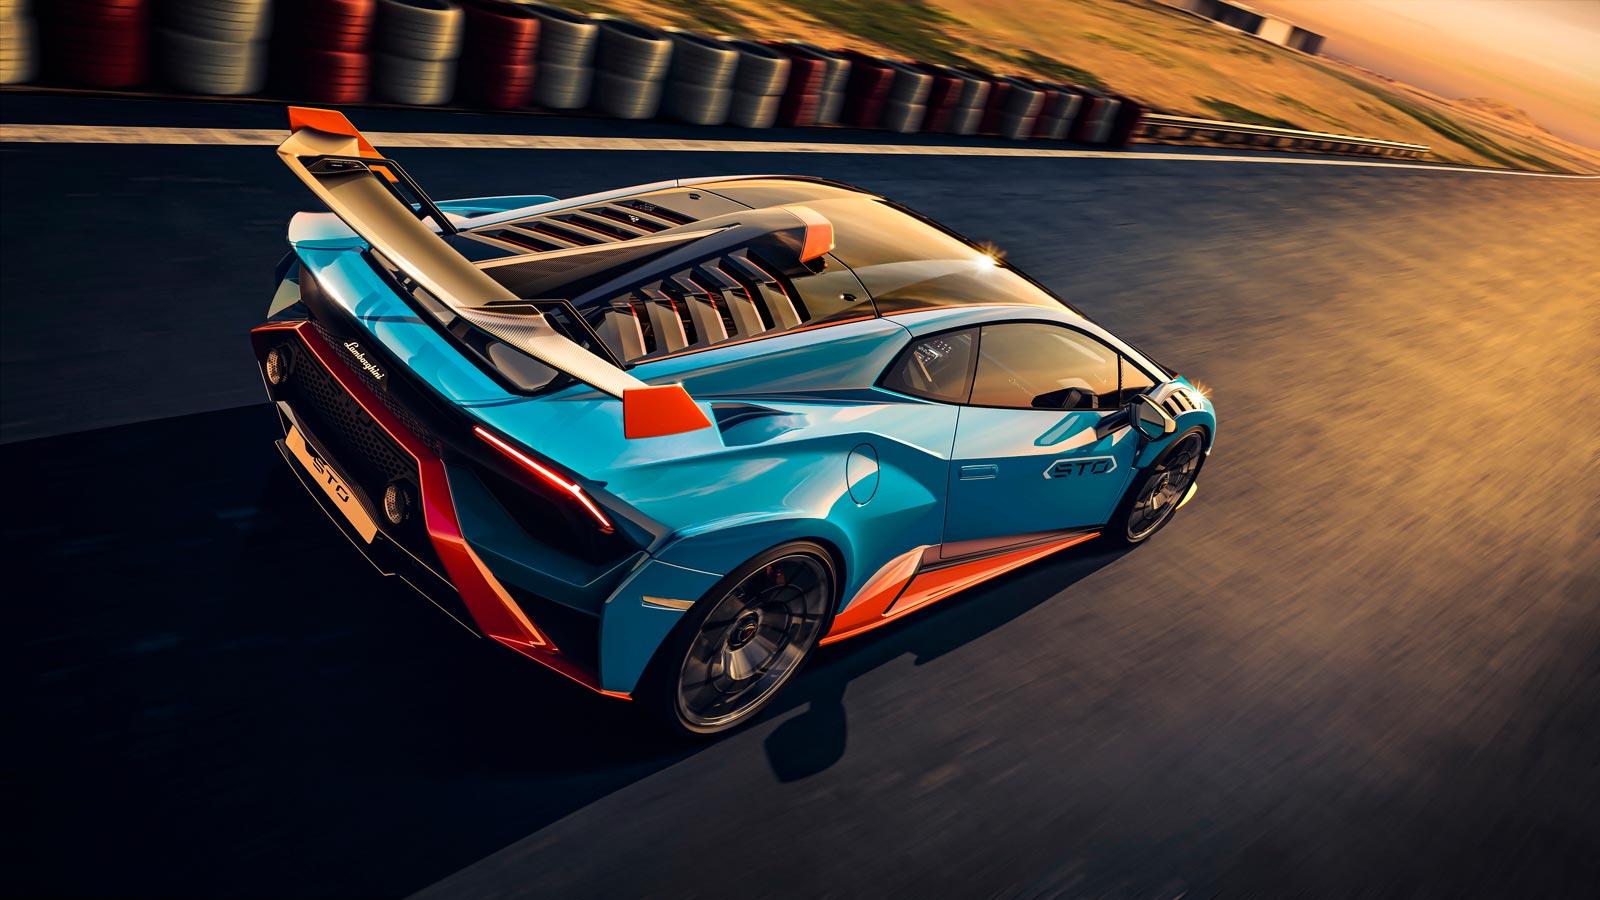 Lamborghini Huracan STO - From racetrack to road image 13